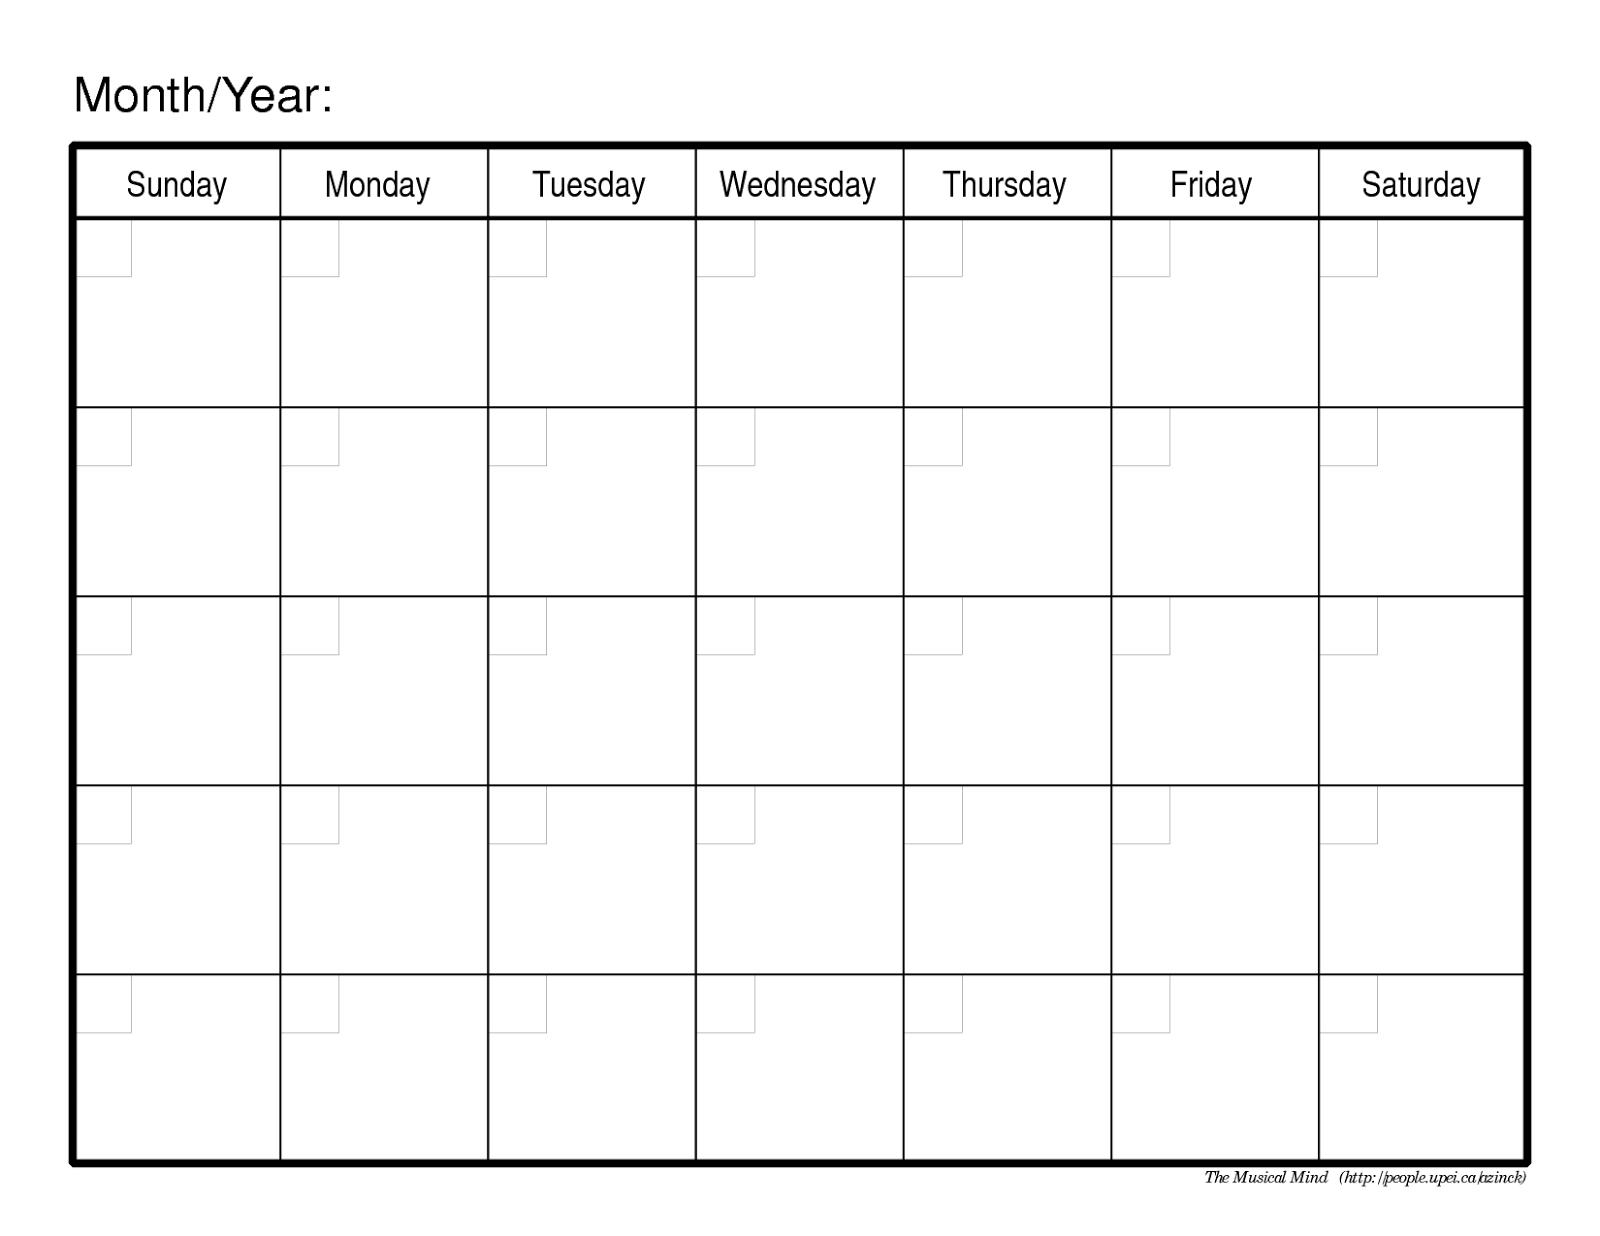 Weekly Calendar No Dates | Jazz Gear